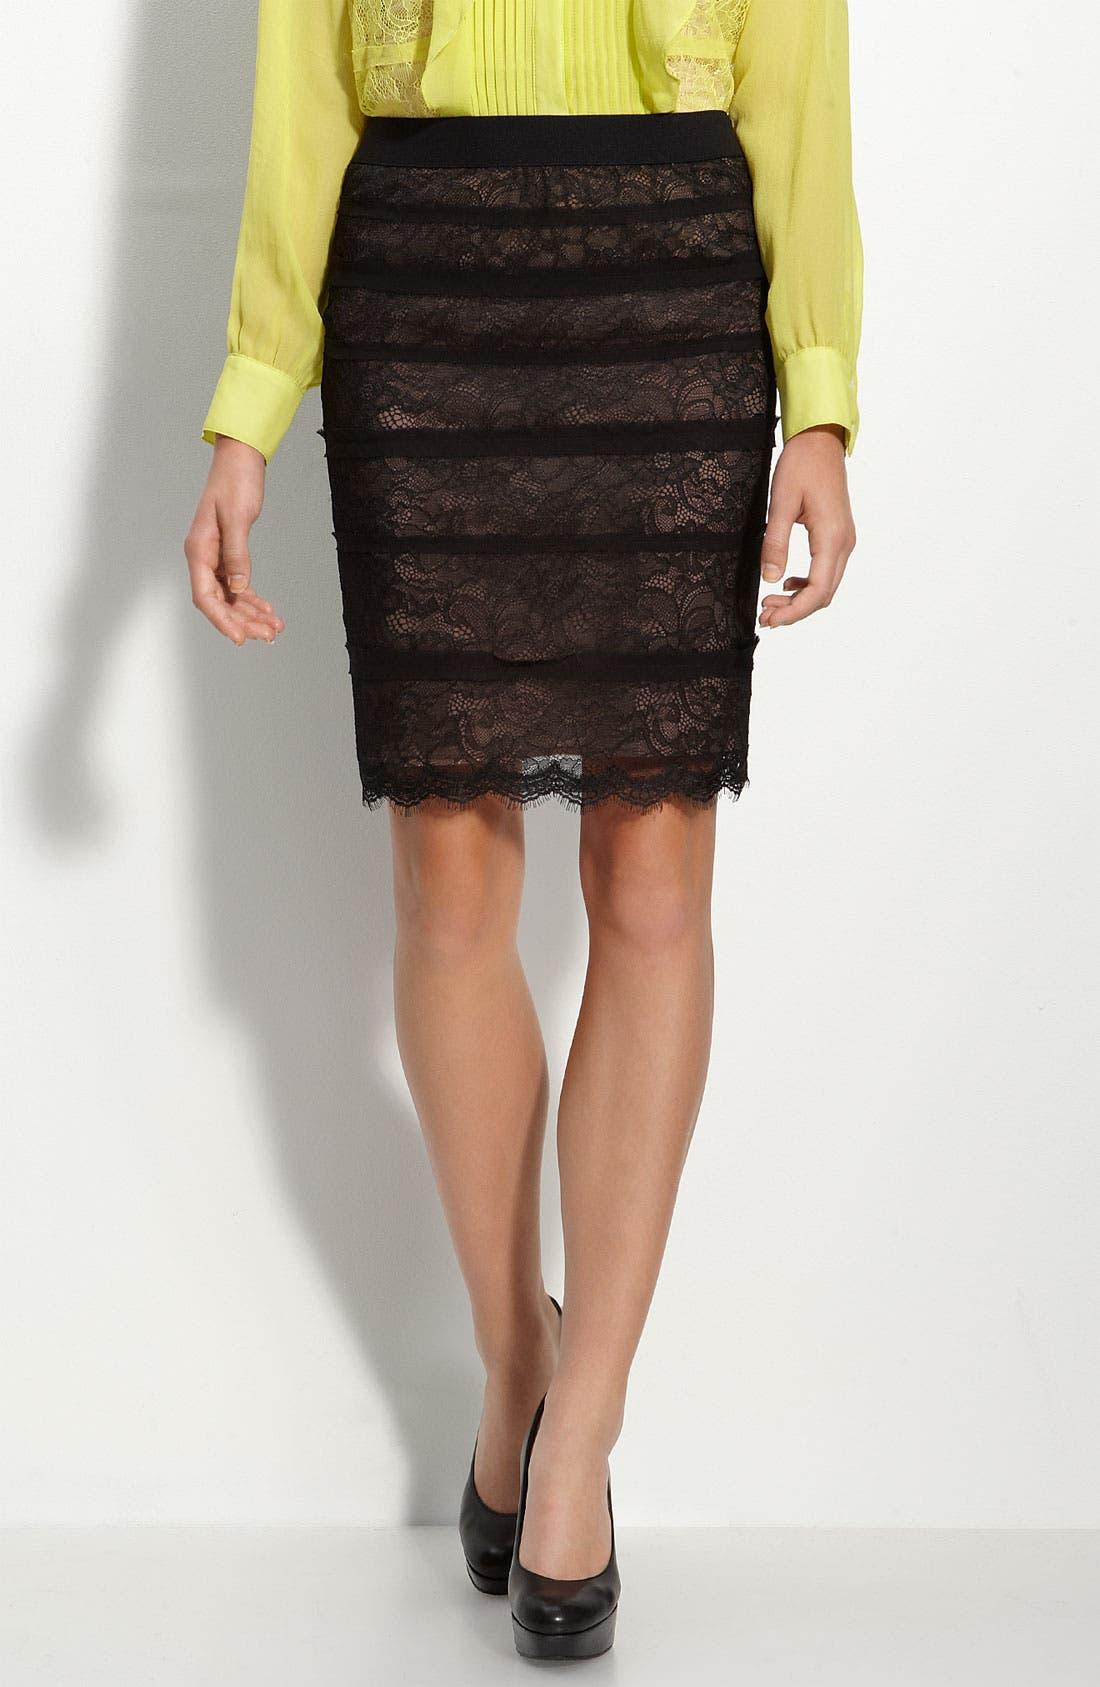 Alternate Image 1 Selected - BCBGMAXAZRIA 'Jocelyn' Lace Pencil Skirt